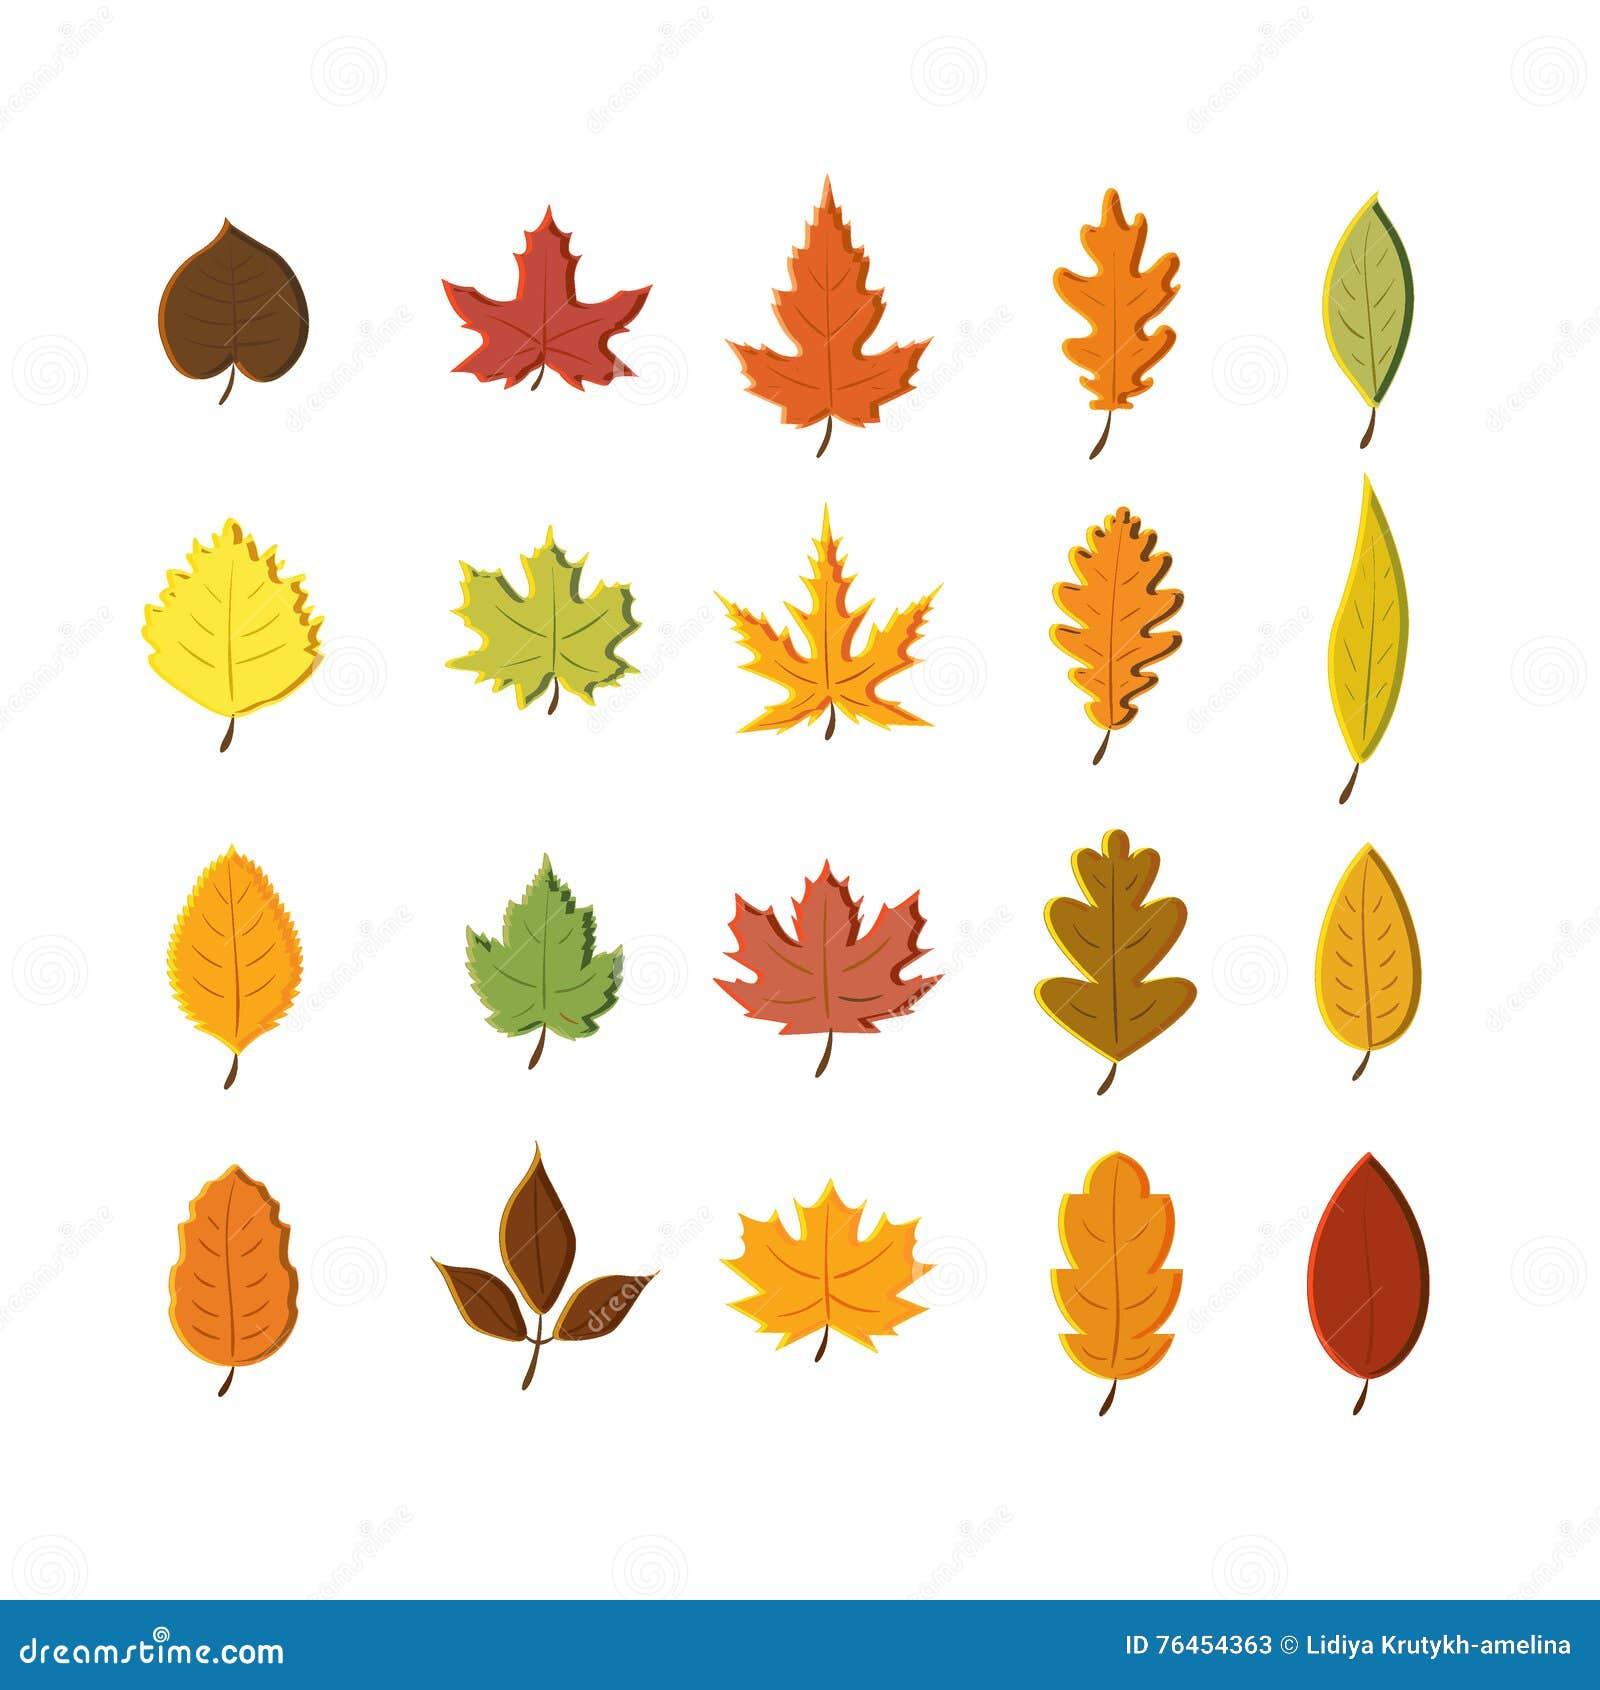 autumn leaves set isolated on white background simple cartoon flat rh dreamstime com fall leaves cartoon pictures fall leaf cartoon